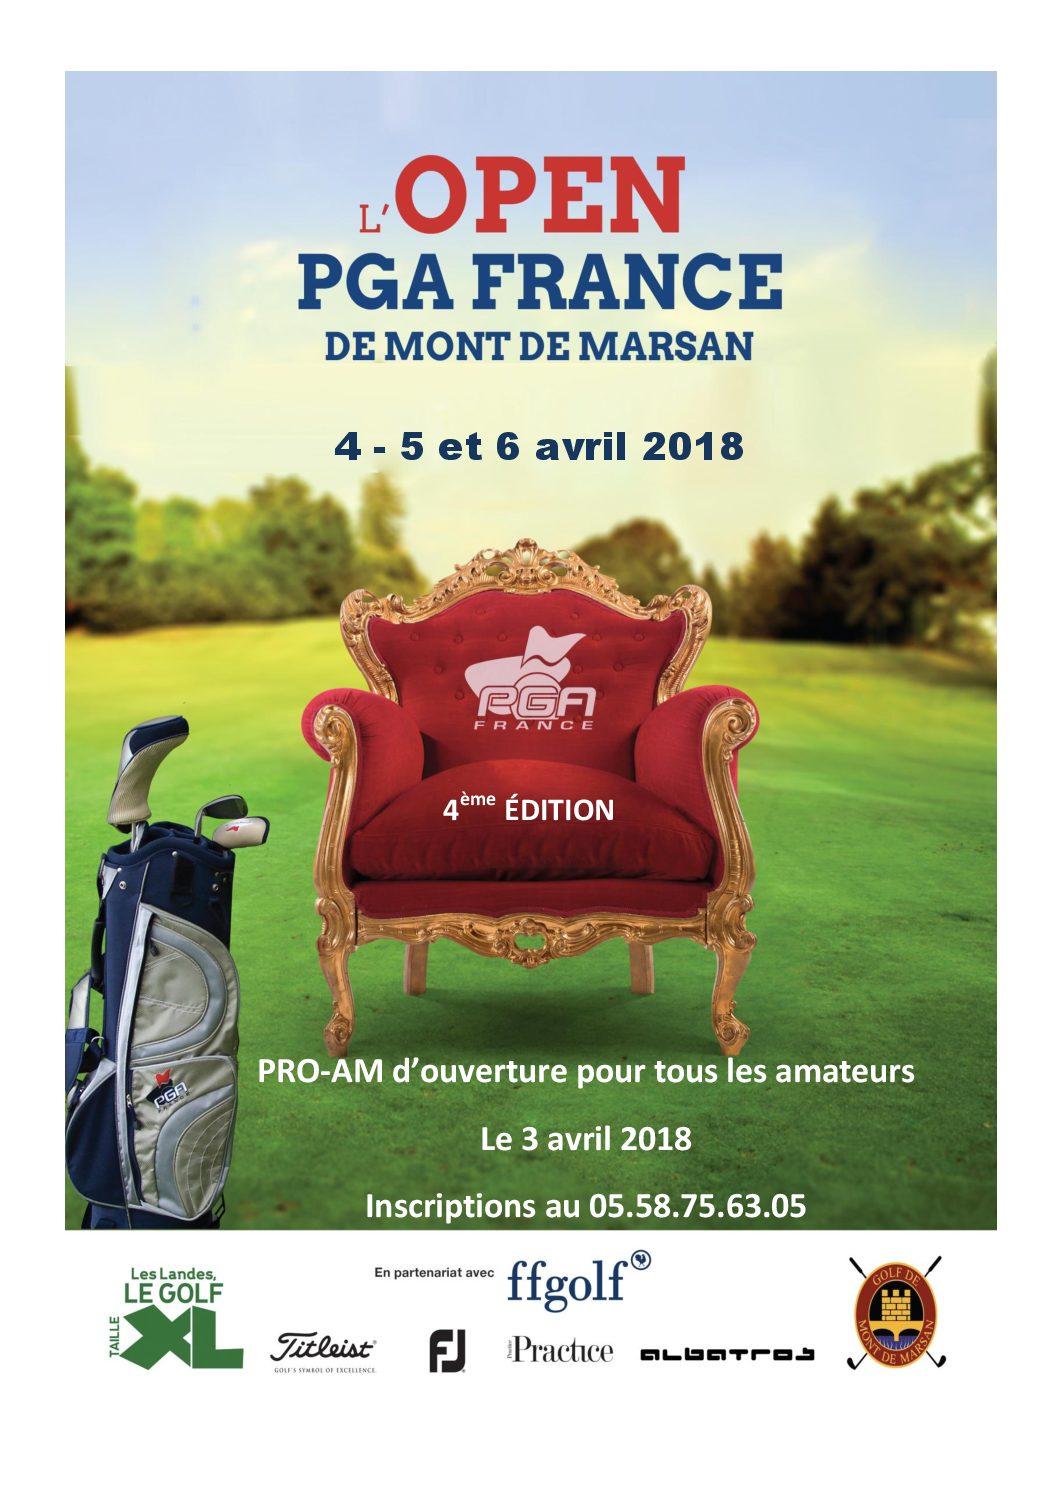 OPEN PGA FRANCE 2018